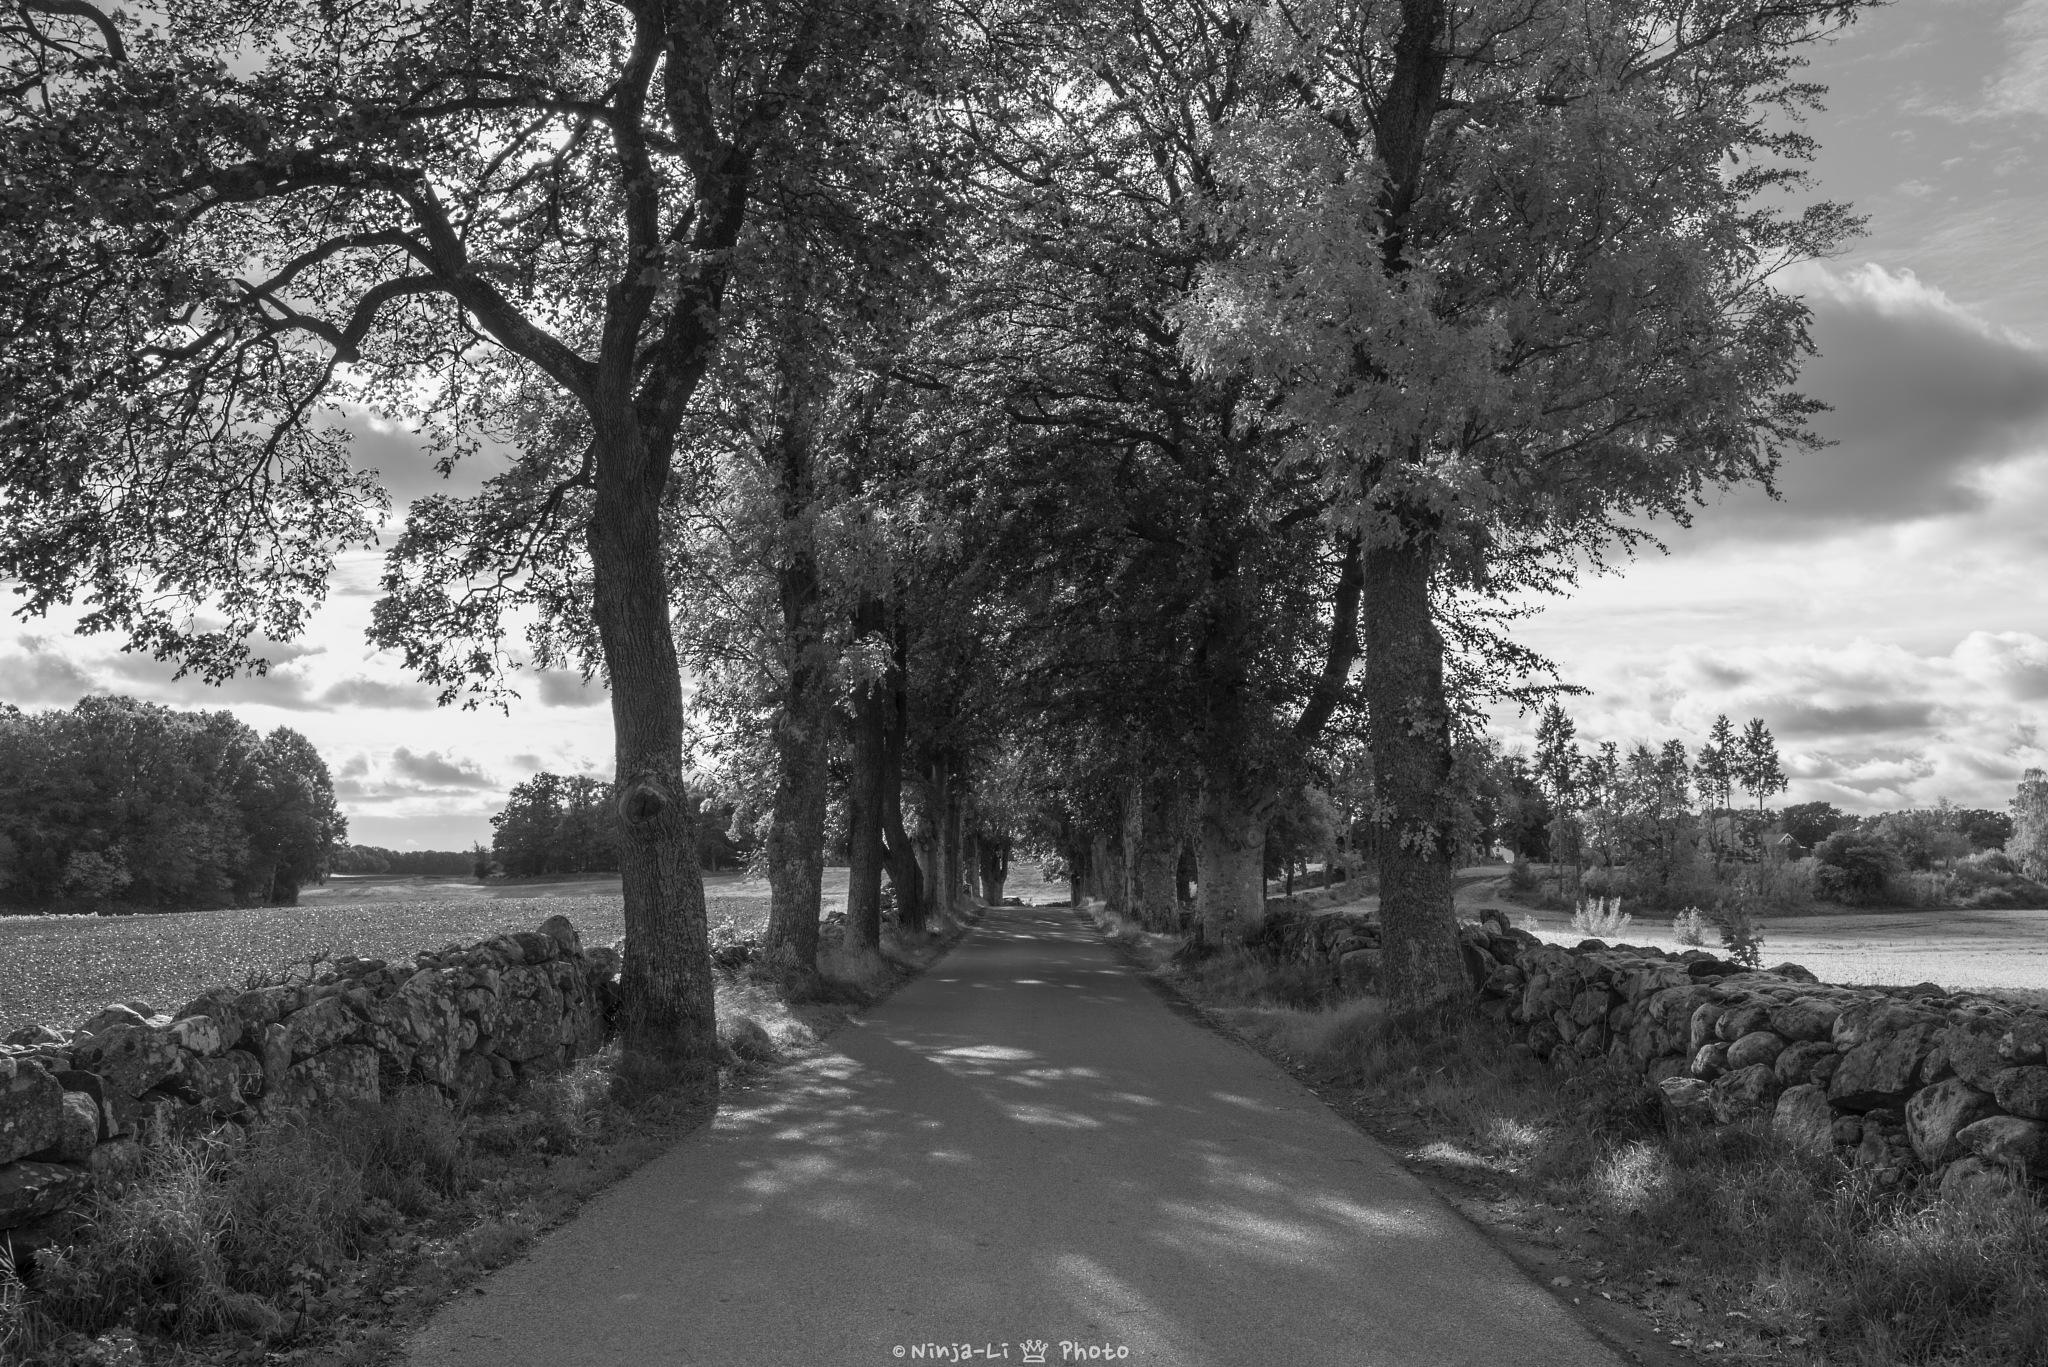 Beautiful road by Ninja-Li Einarsen Stahre